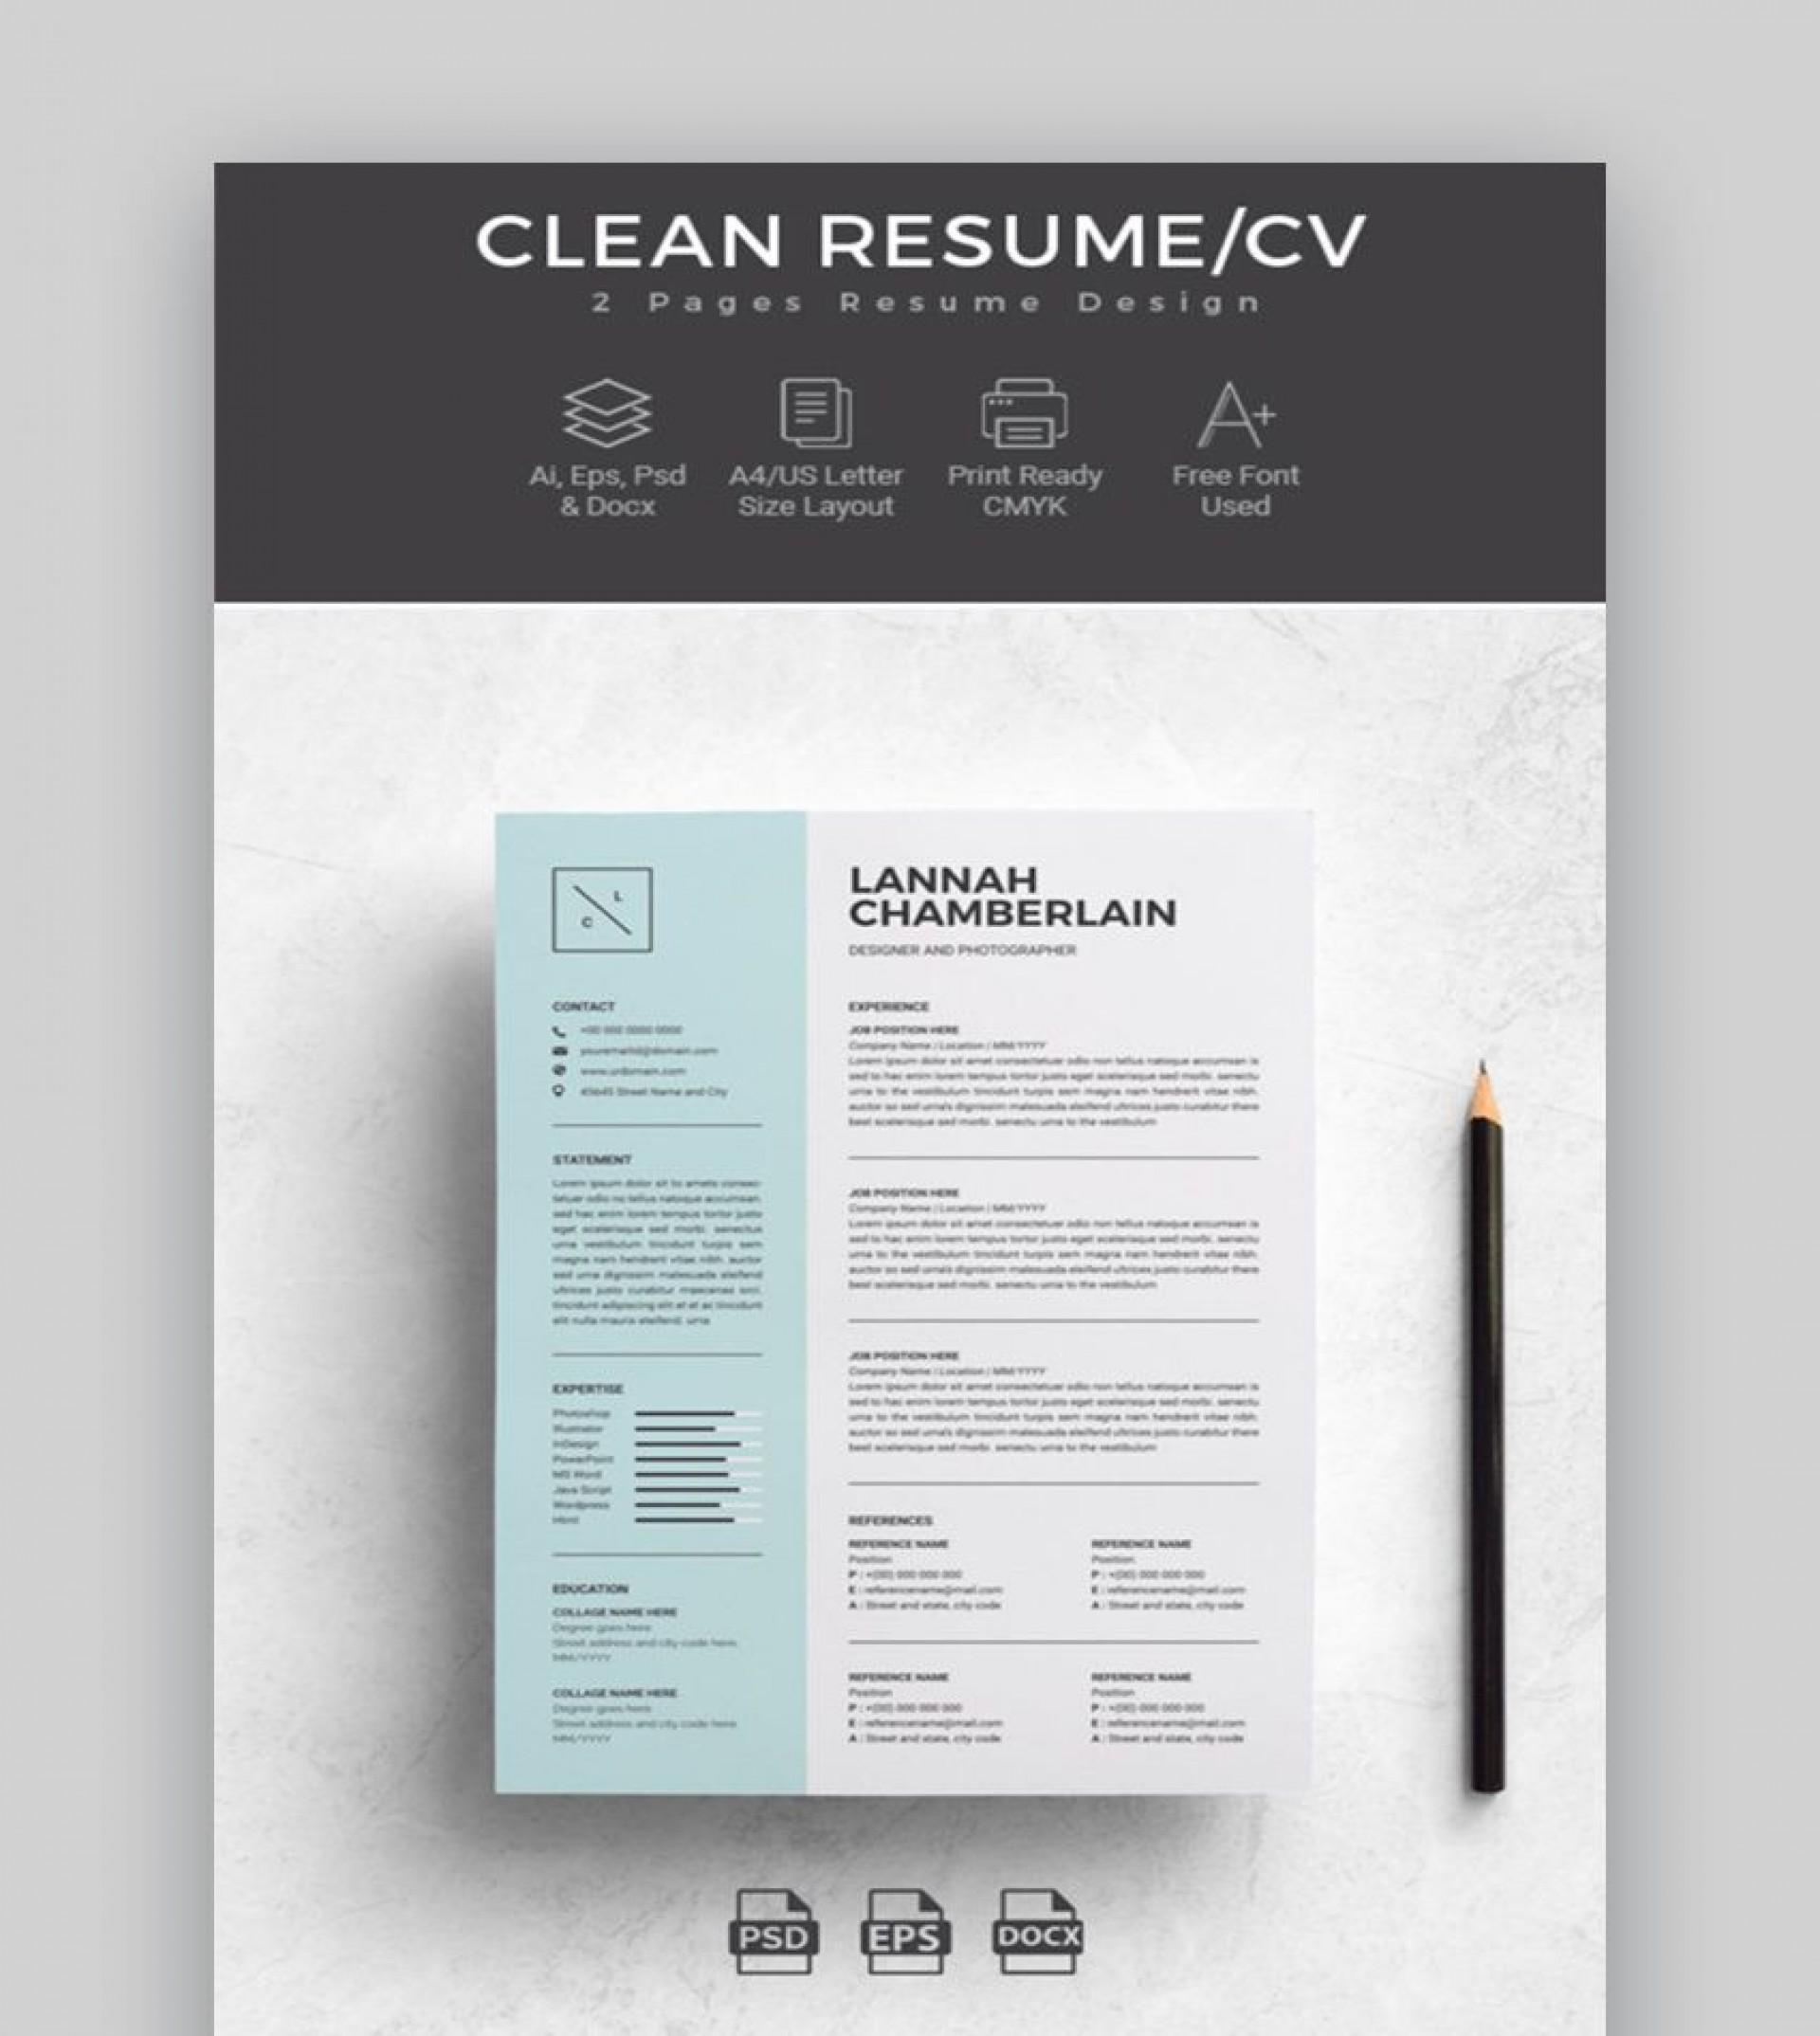 001 Shocking Free Resume Template Microsoft Office Word 2007 High Def 1920